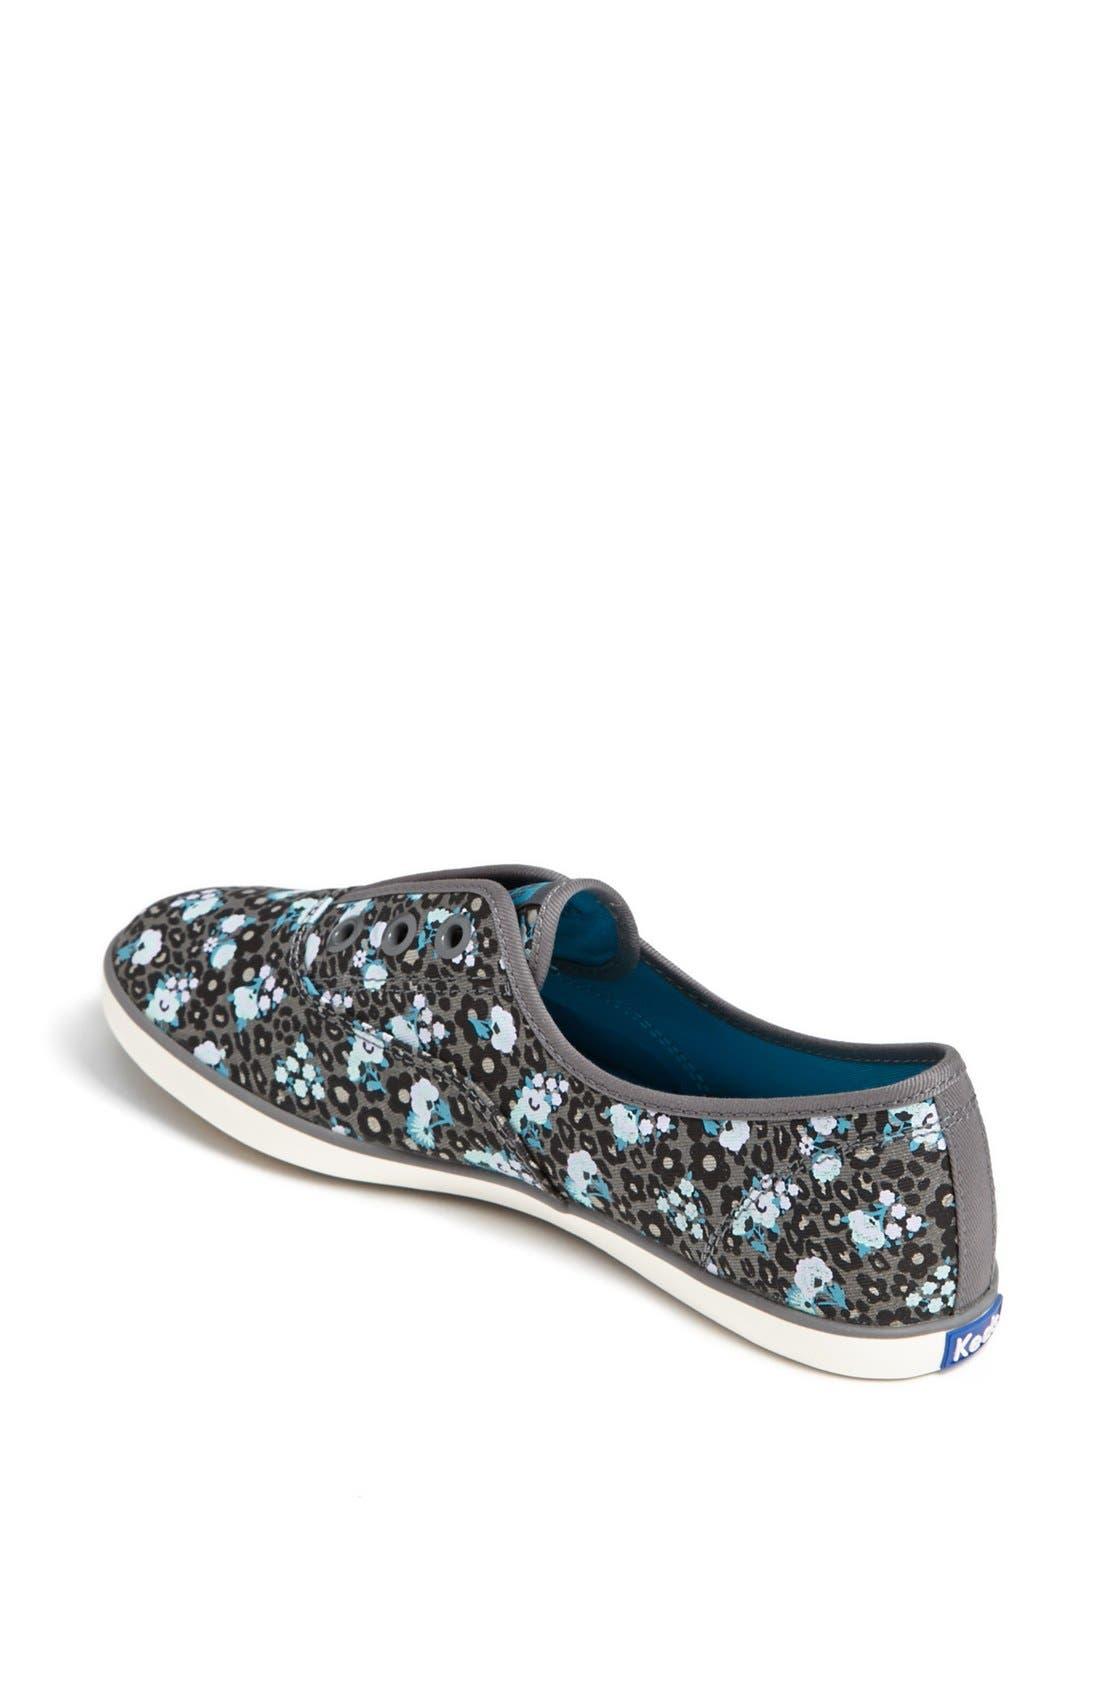 Alternate Image 2  - Keds® 'Rookie - Leopard Floral' Laceless Sneaker (Women)